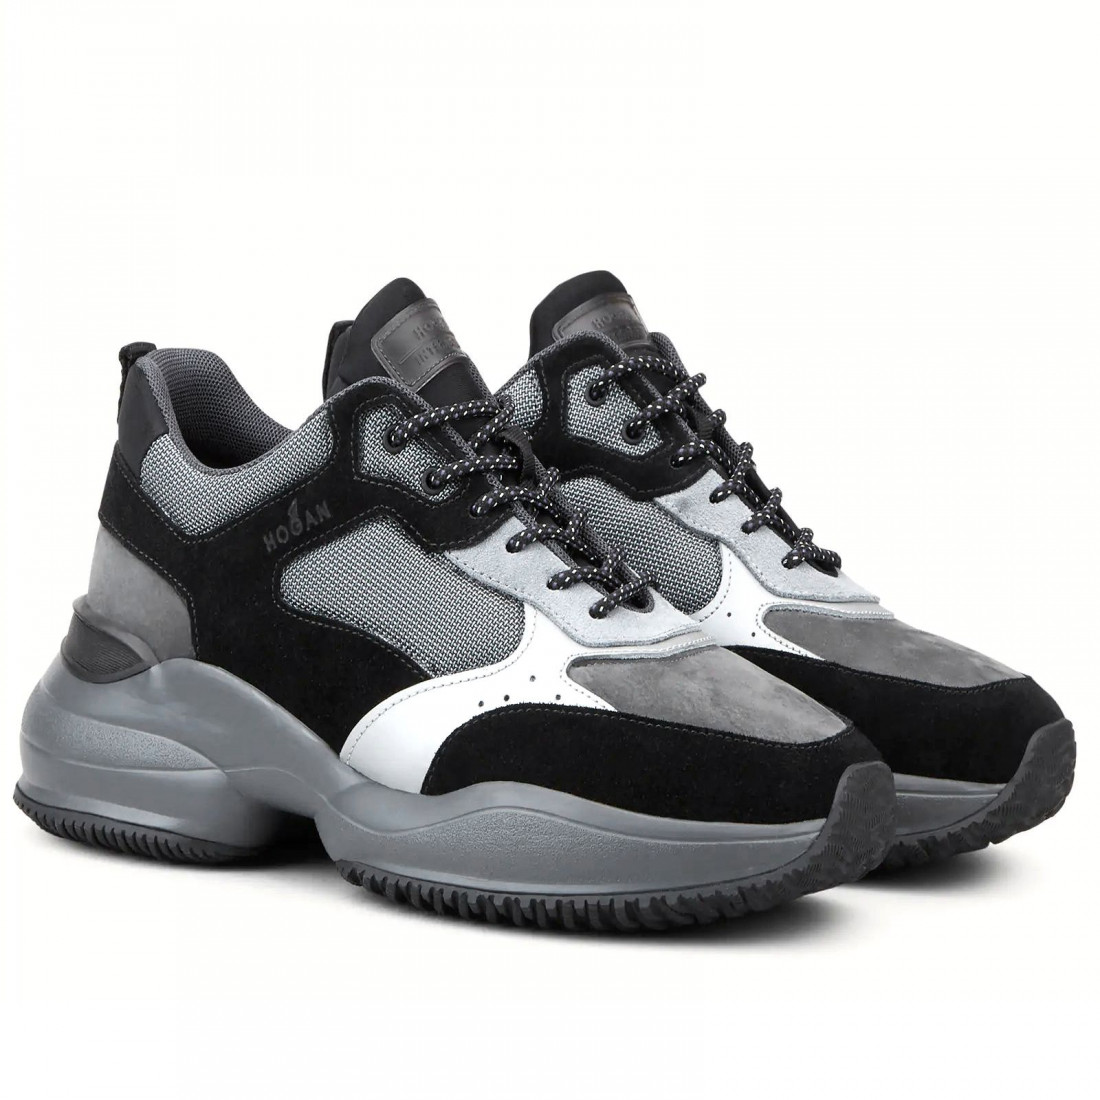 Sneaker da uomo Hogan Interaction grigia e nera